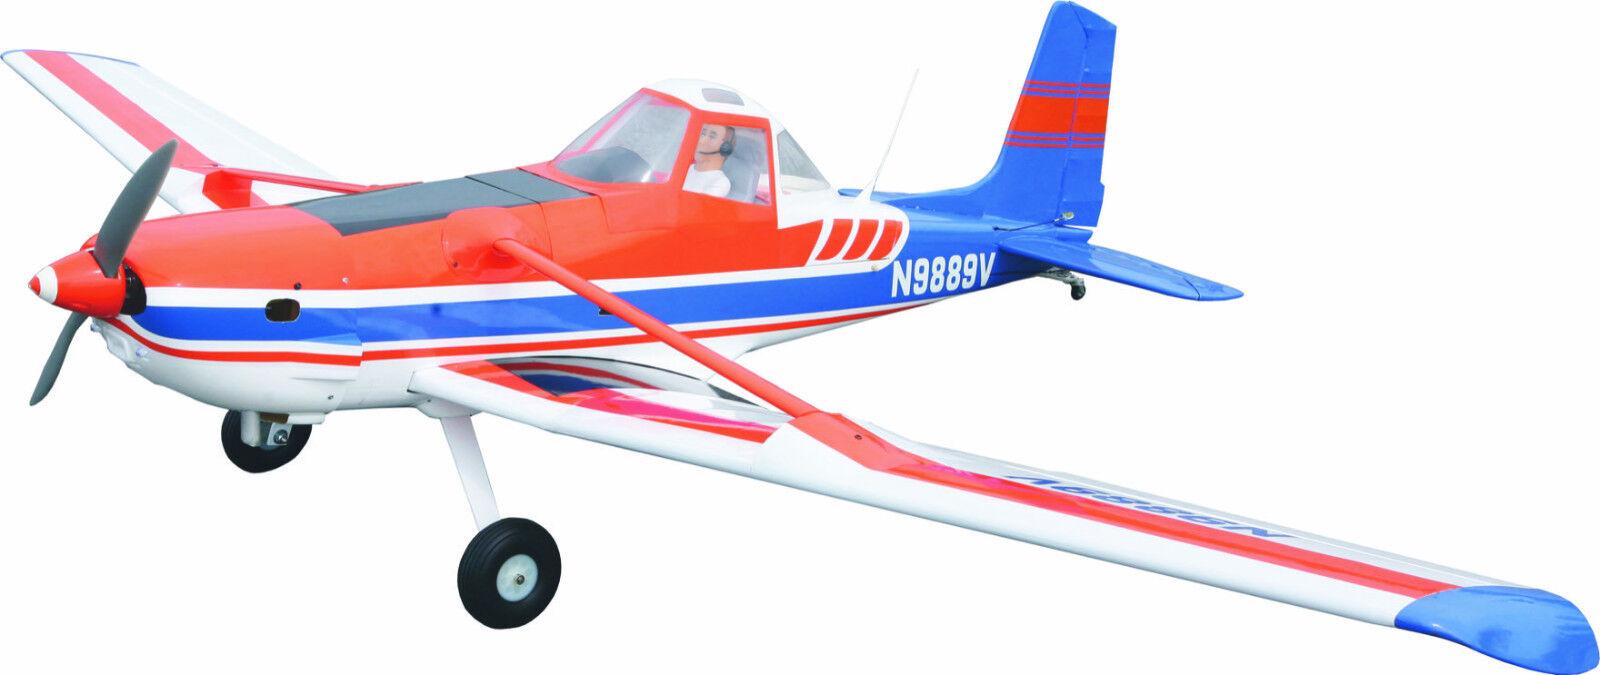 Cessna 188 ARF AGwagon SIMPROP 0292222 2468 mm apertura ARF